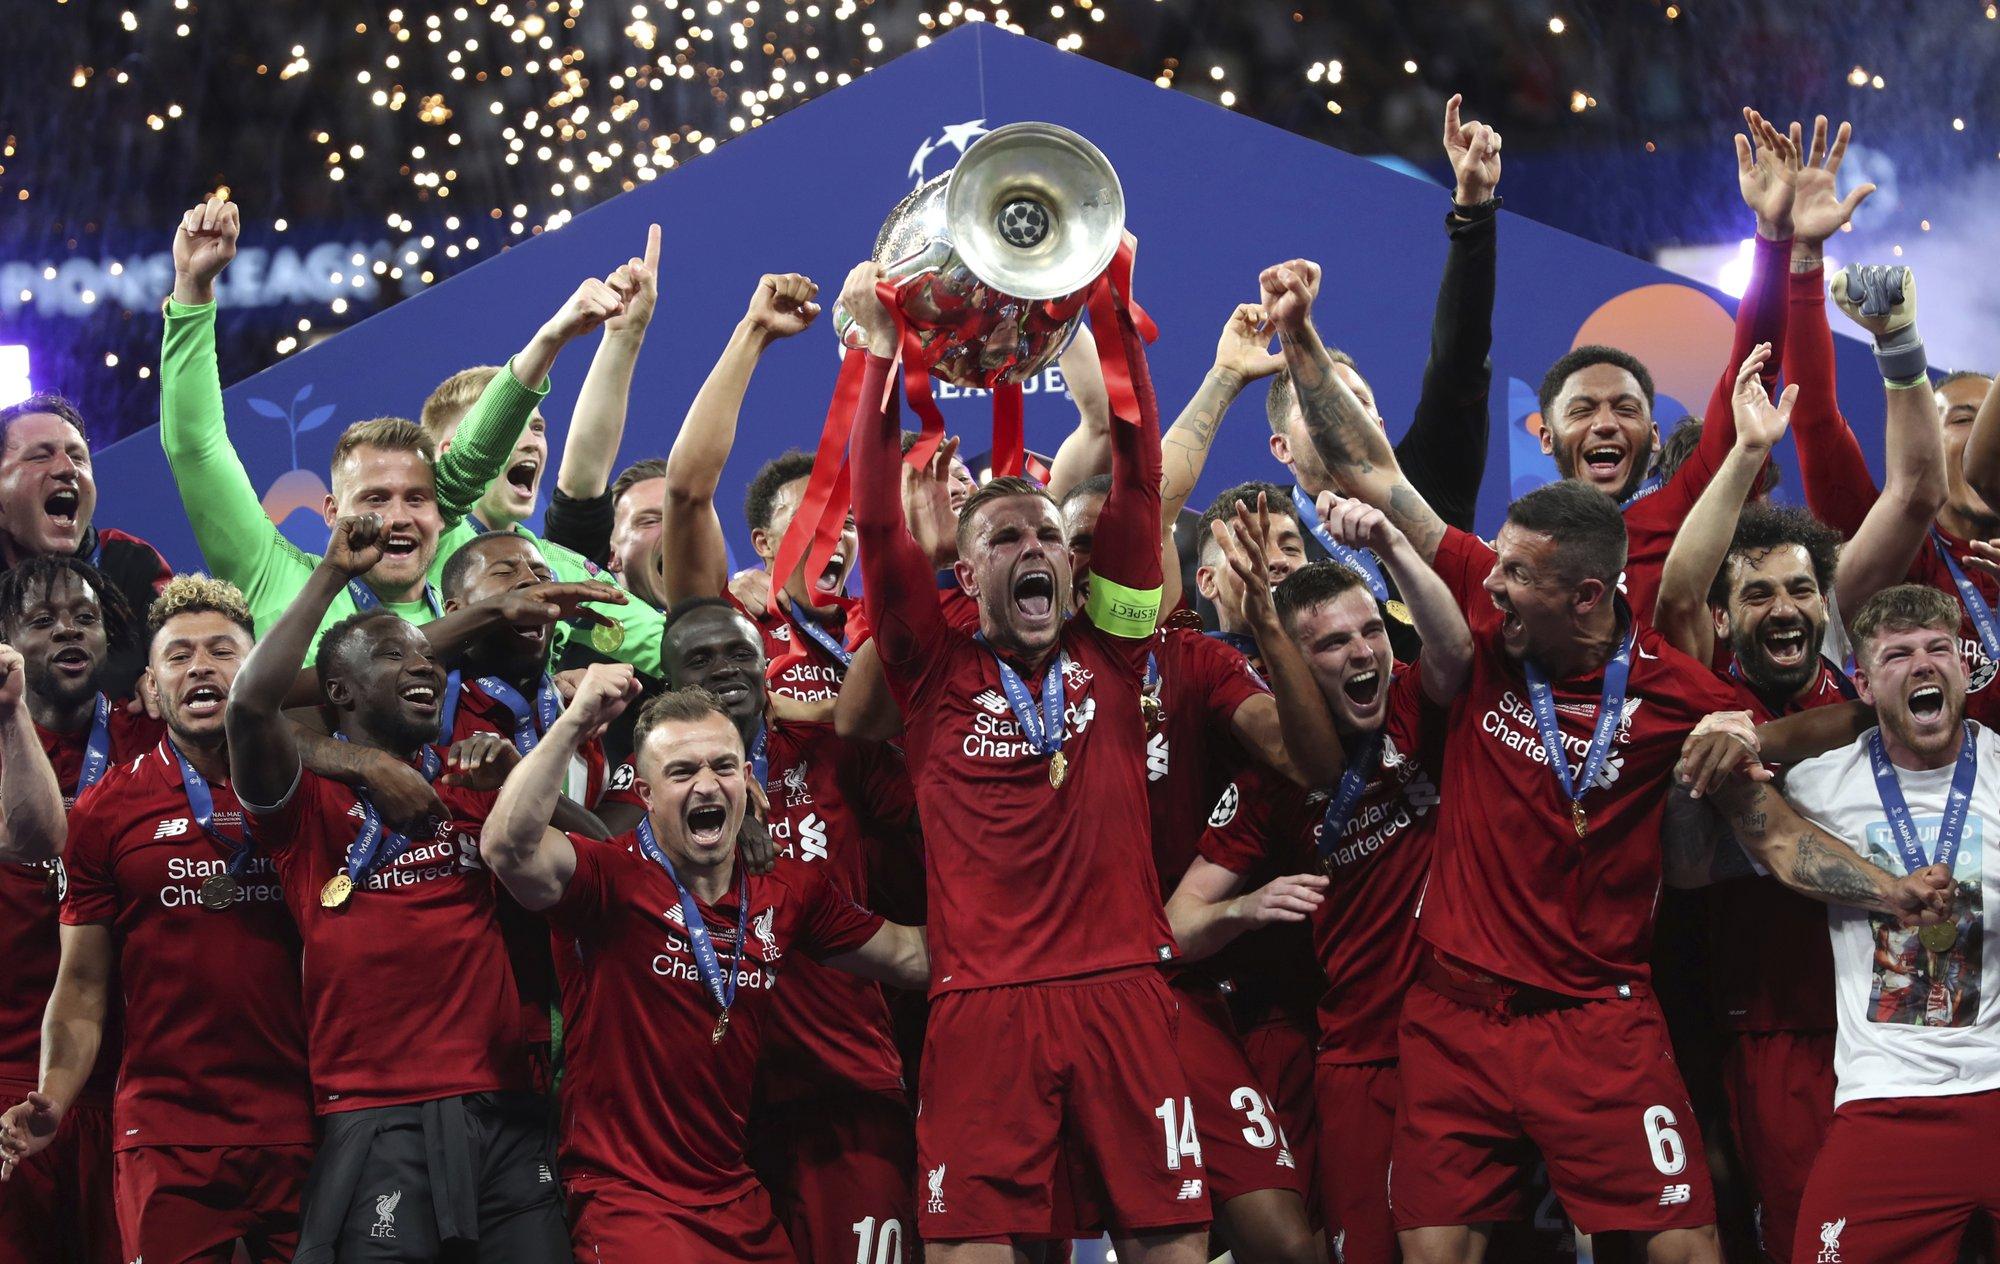 Liverpool beats Tottenham 2-0 to win sixth European title